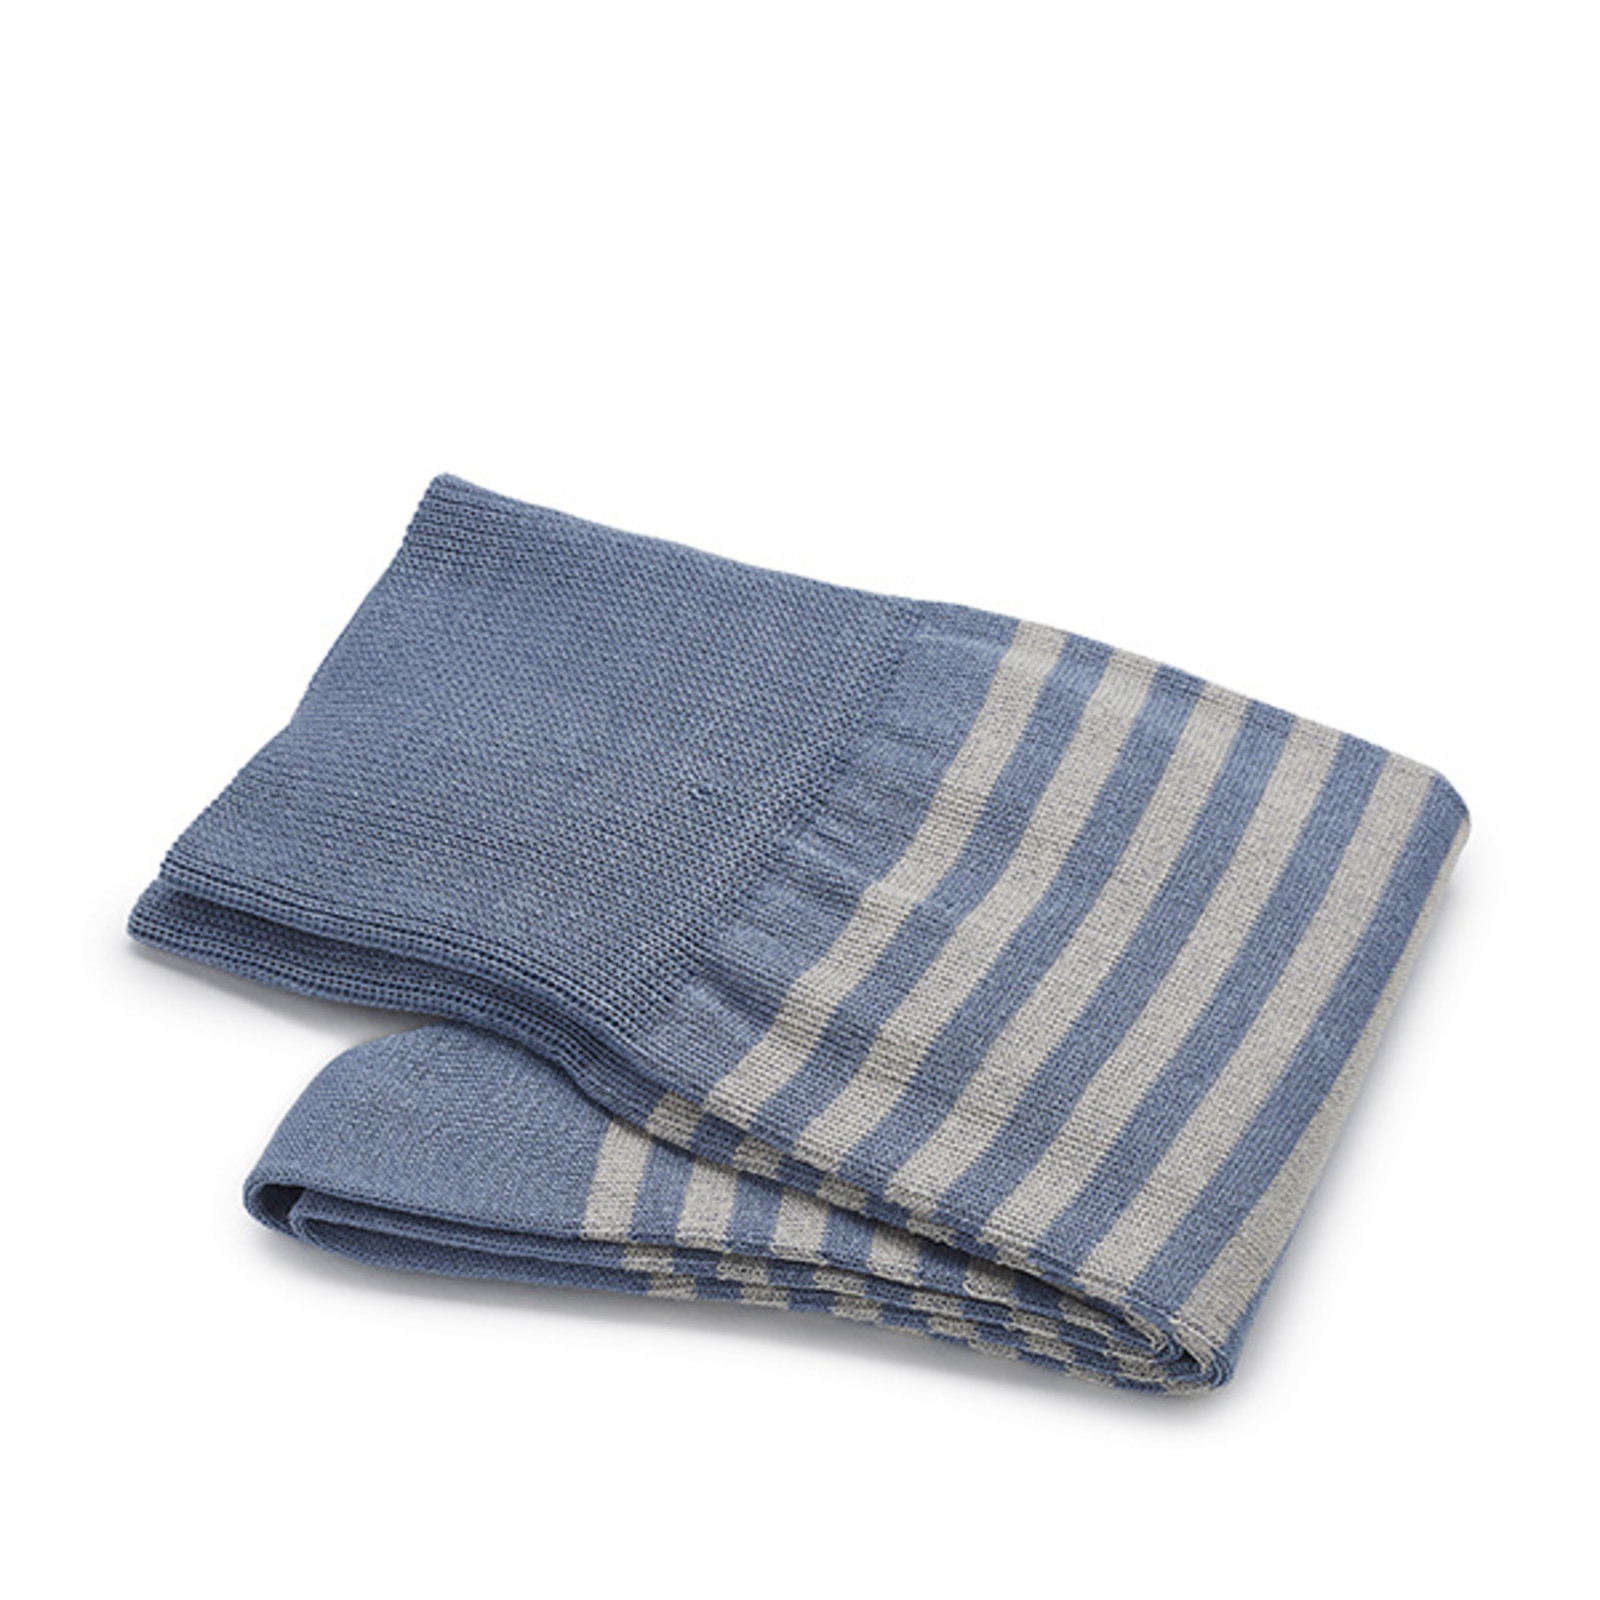 Carlo Lanza Blau/ graue gestreifte Socken